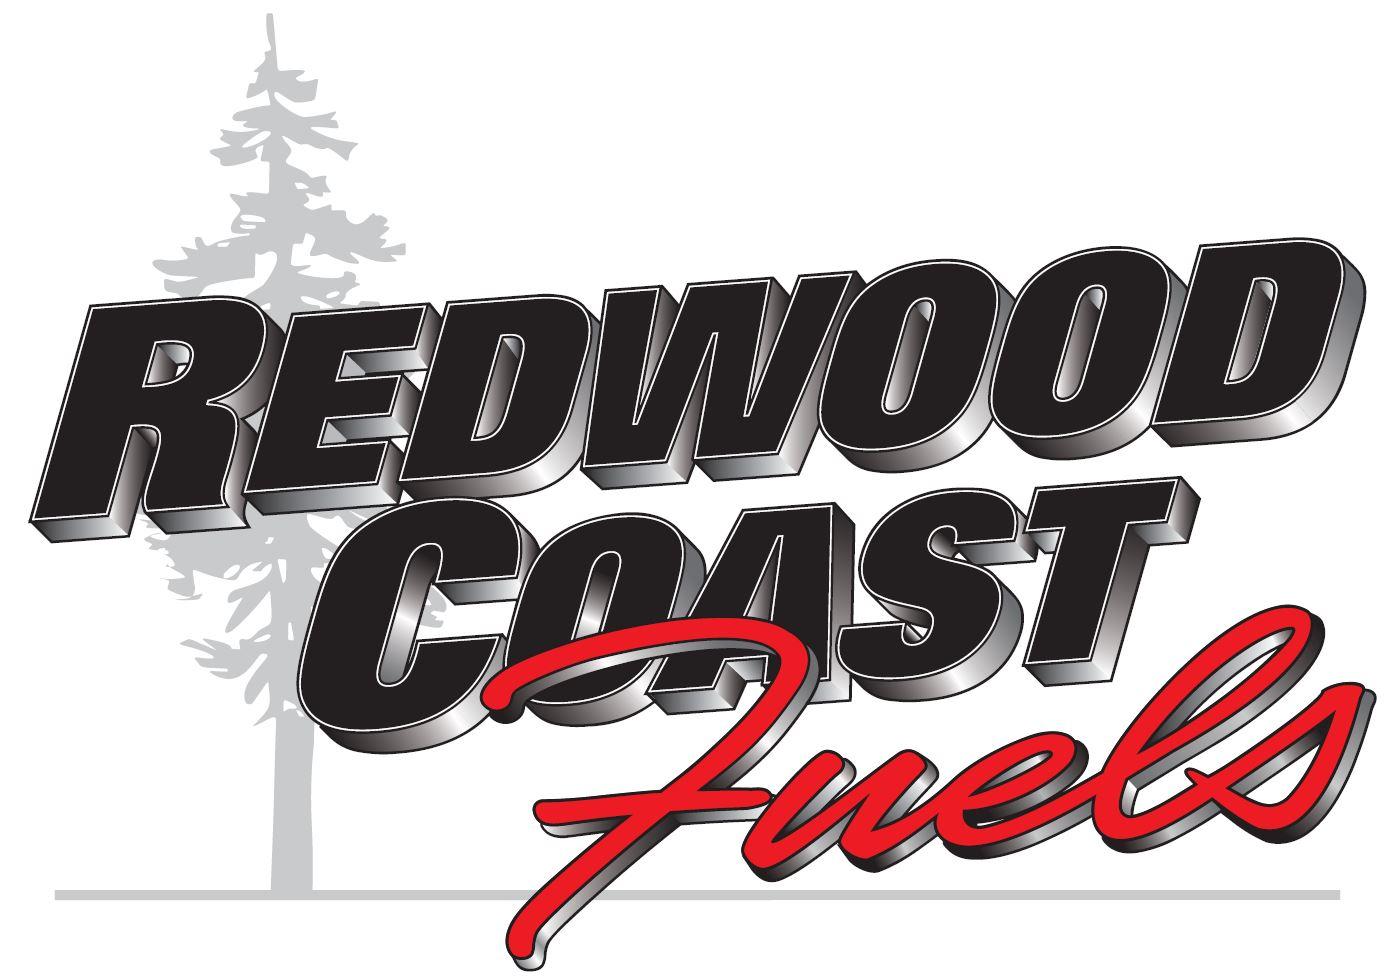 Redwood Coast Fuels logo